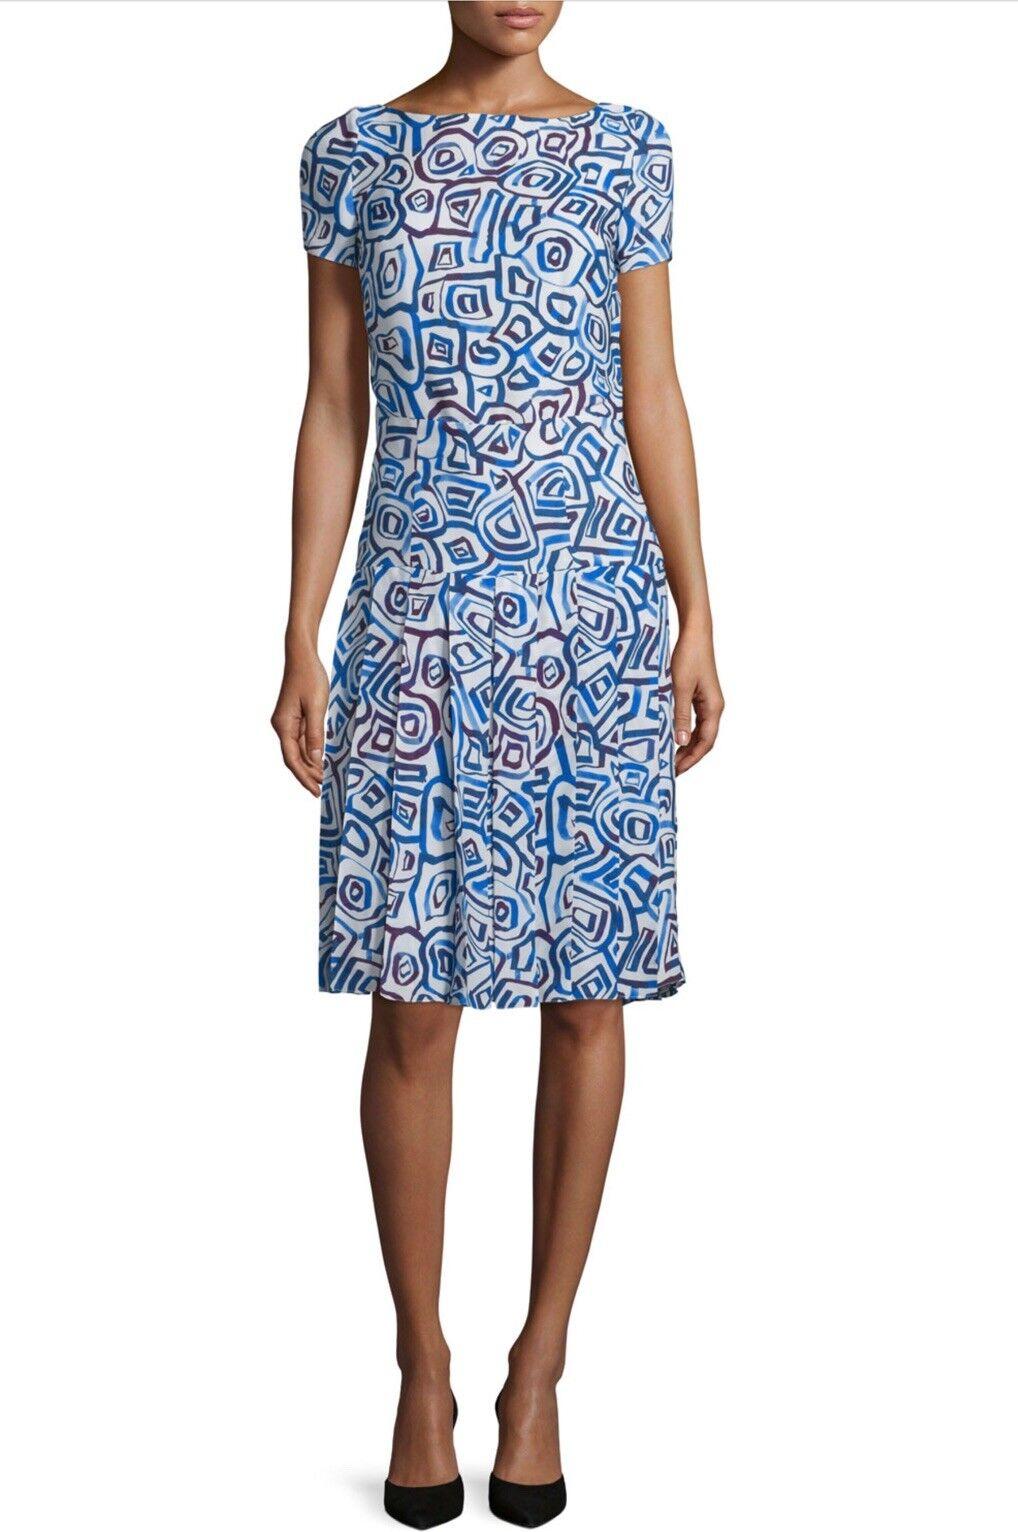 NWT   2190 Oscar de la Renta Abstract Watercolor Print Dress Sz 4, bluee